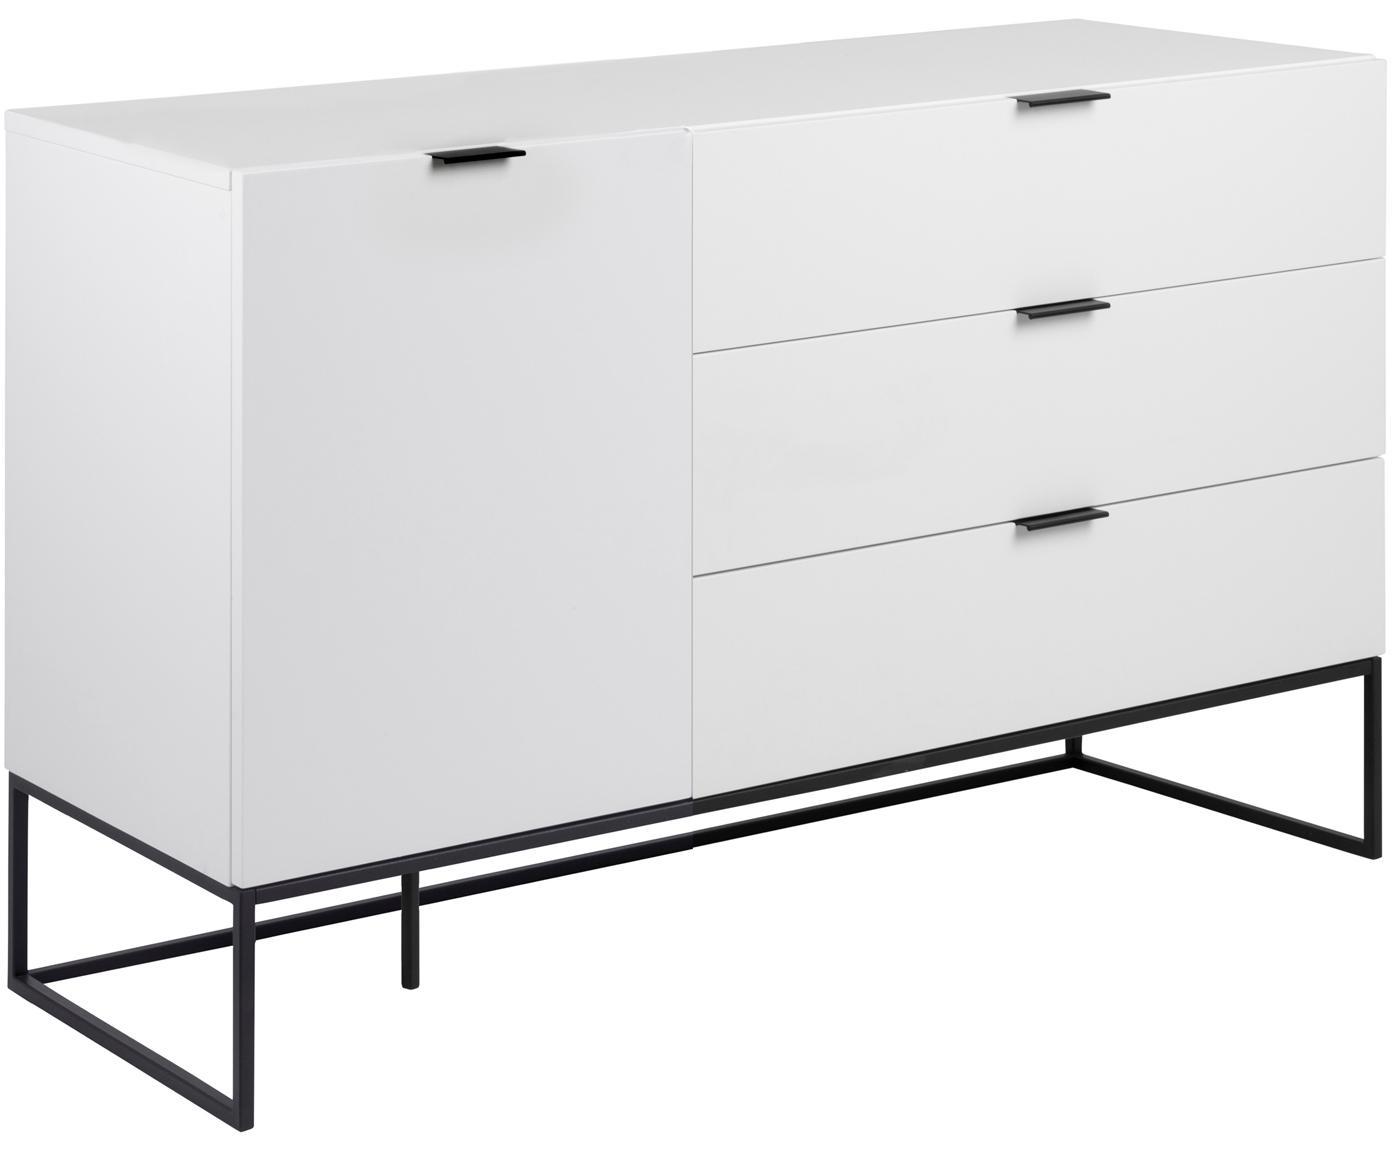 Aparador cajonera Kobe, Blanco, negro, An 134 x F 45 cm